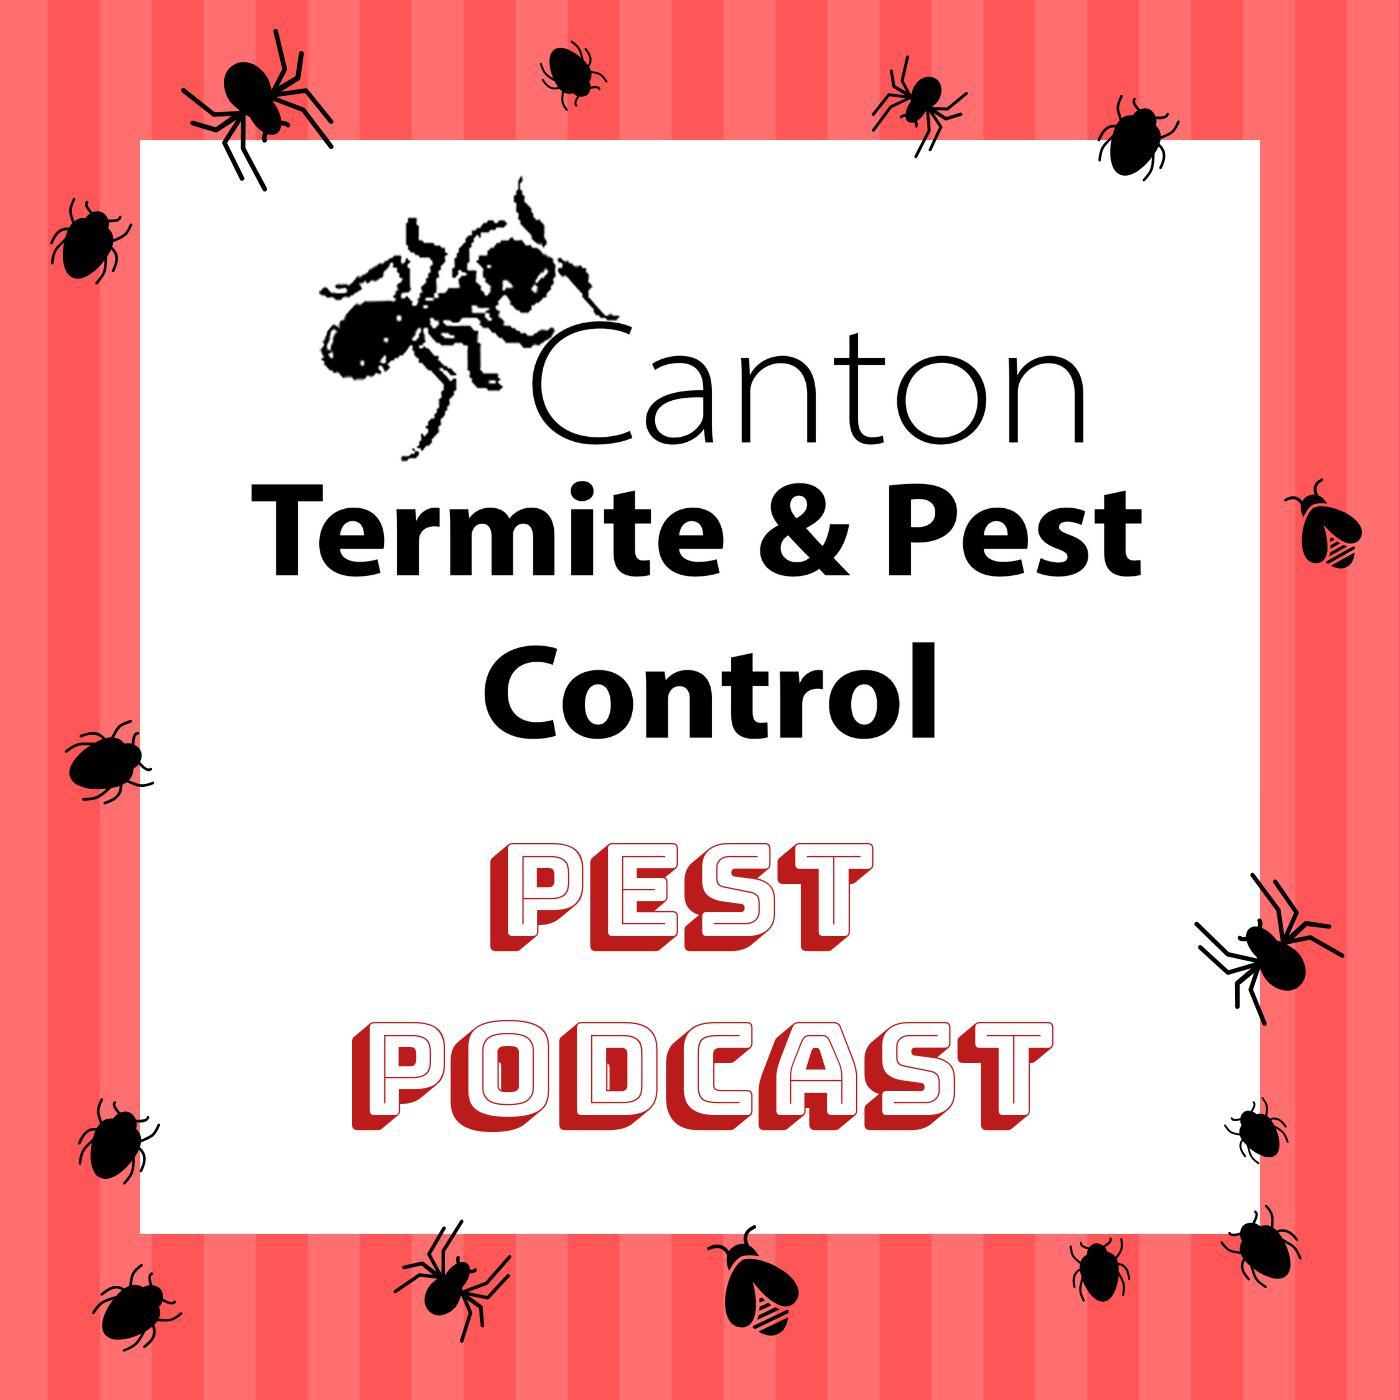 Canton Termite And Pest Control Podcast Canton Termite And Pest Control Podcast Listen Notes